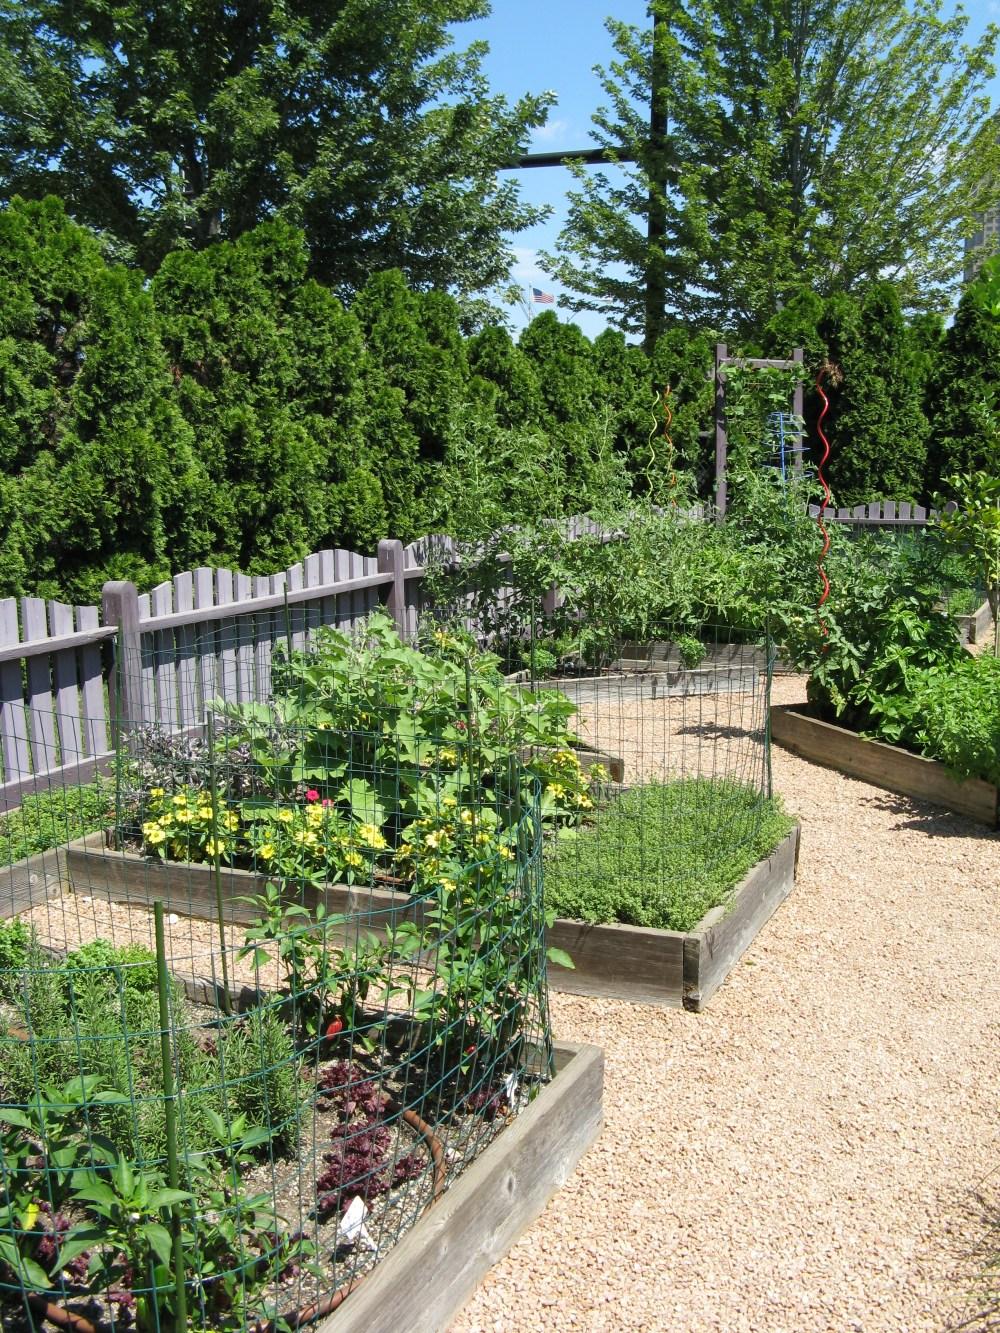 Des Moines IA BHG gardens 8-8-2008 001 (21)